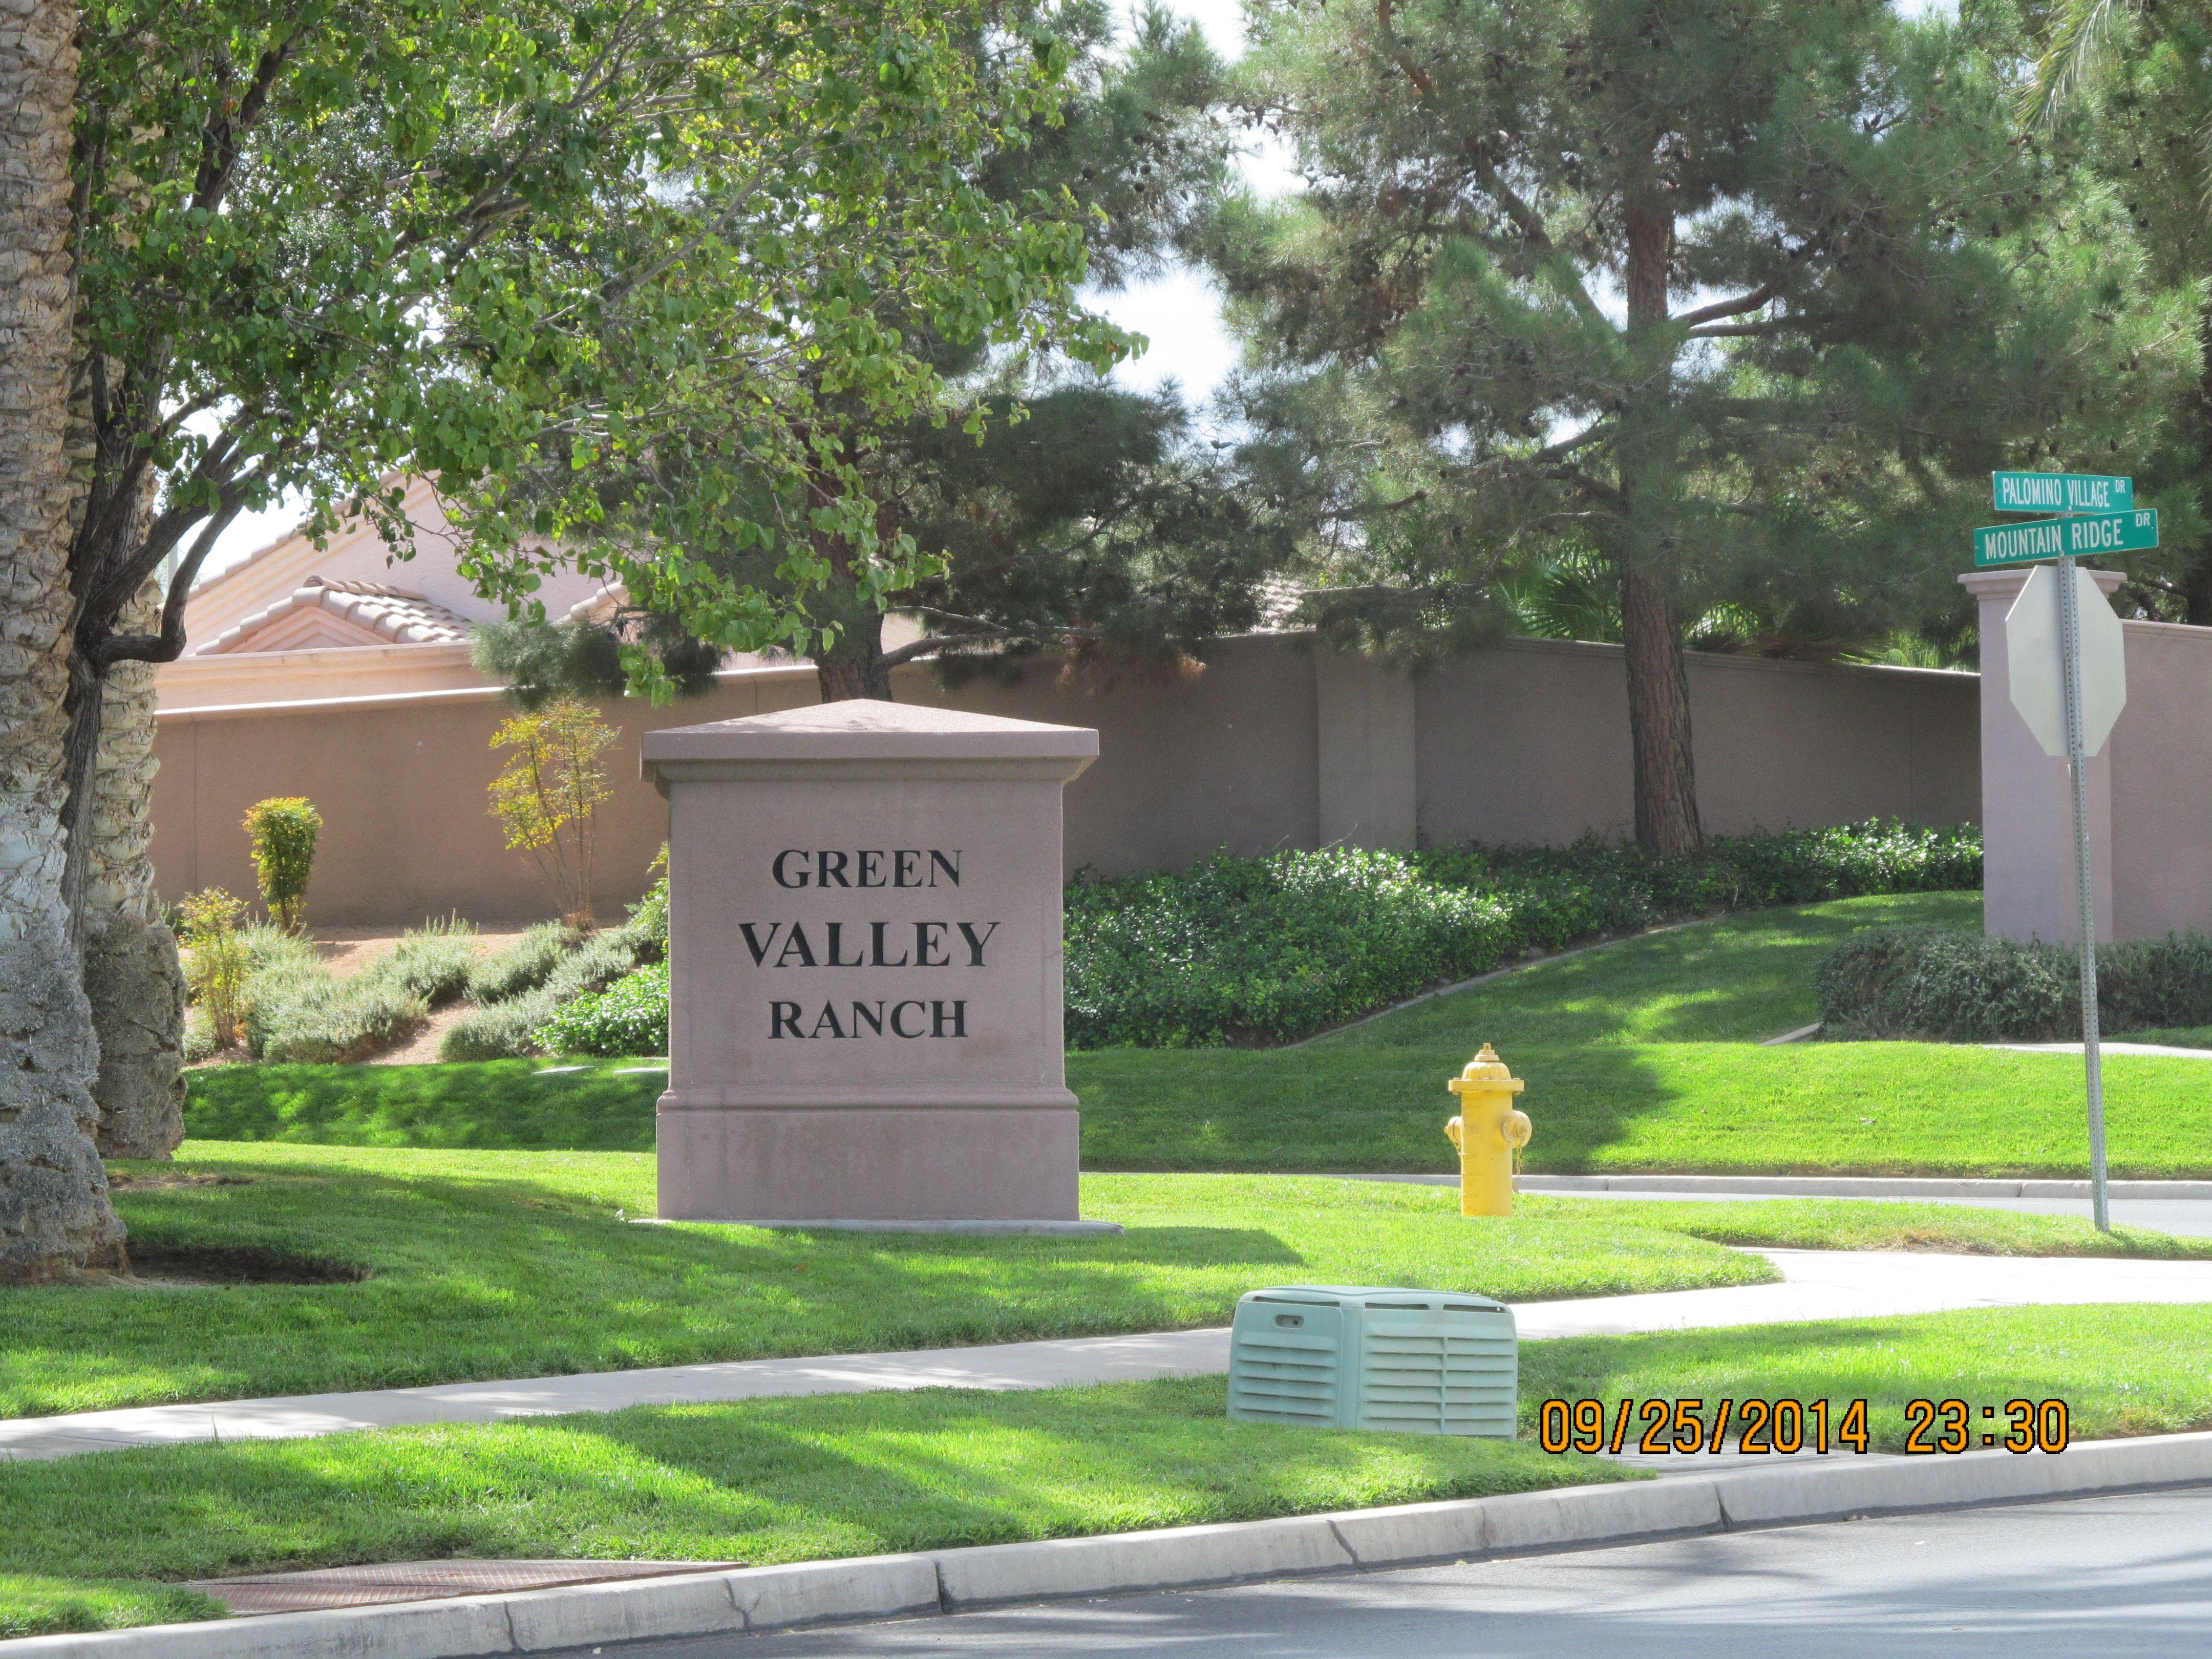 green valley ranch real estate in henderson nevada zip code